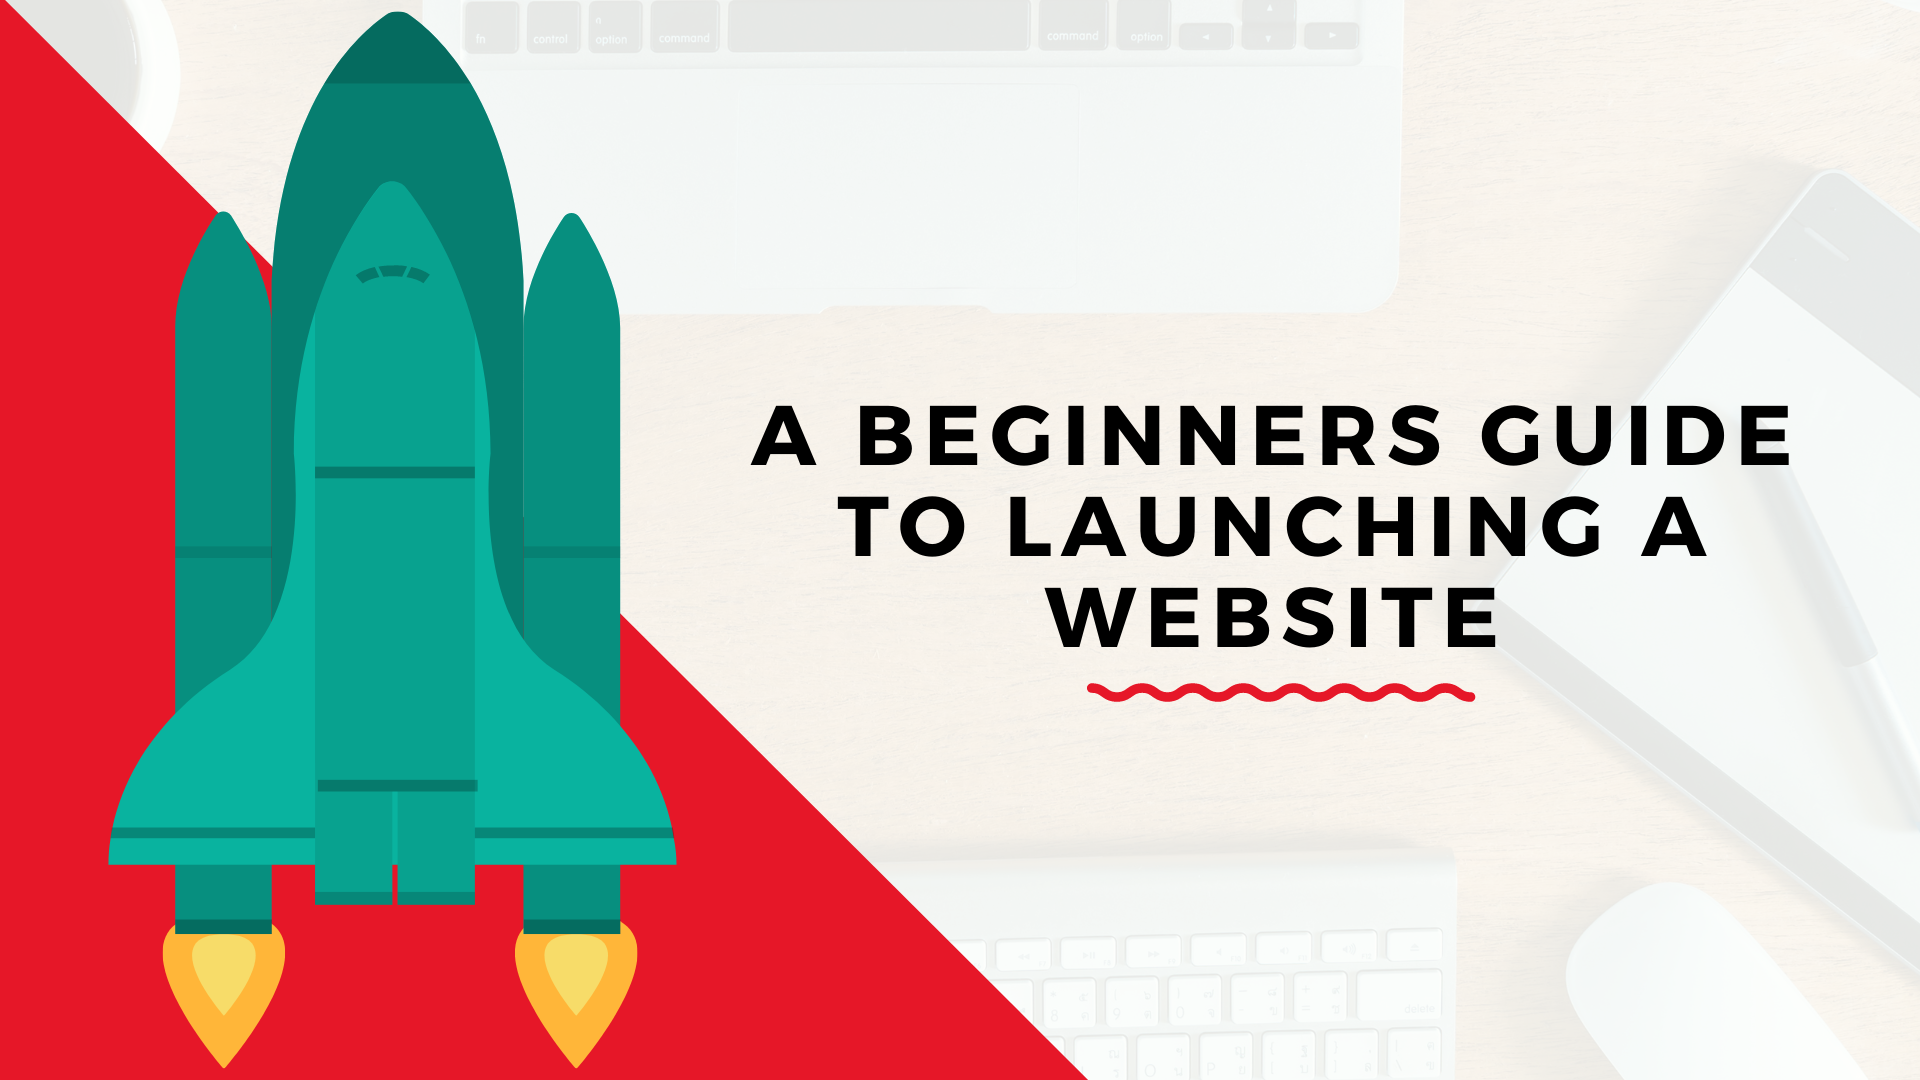 website launch, launching a website 2021, website 2021, starting a website 2021, how to launch a website, beginners guide to website,website guide 2021, website launching 2021, website tips and tricks, website building